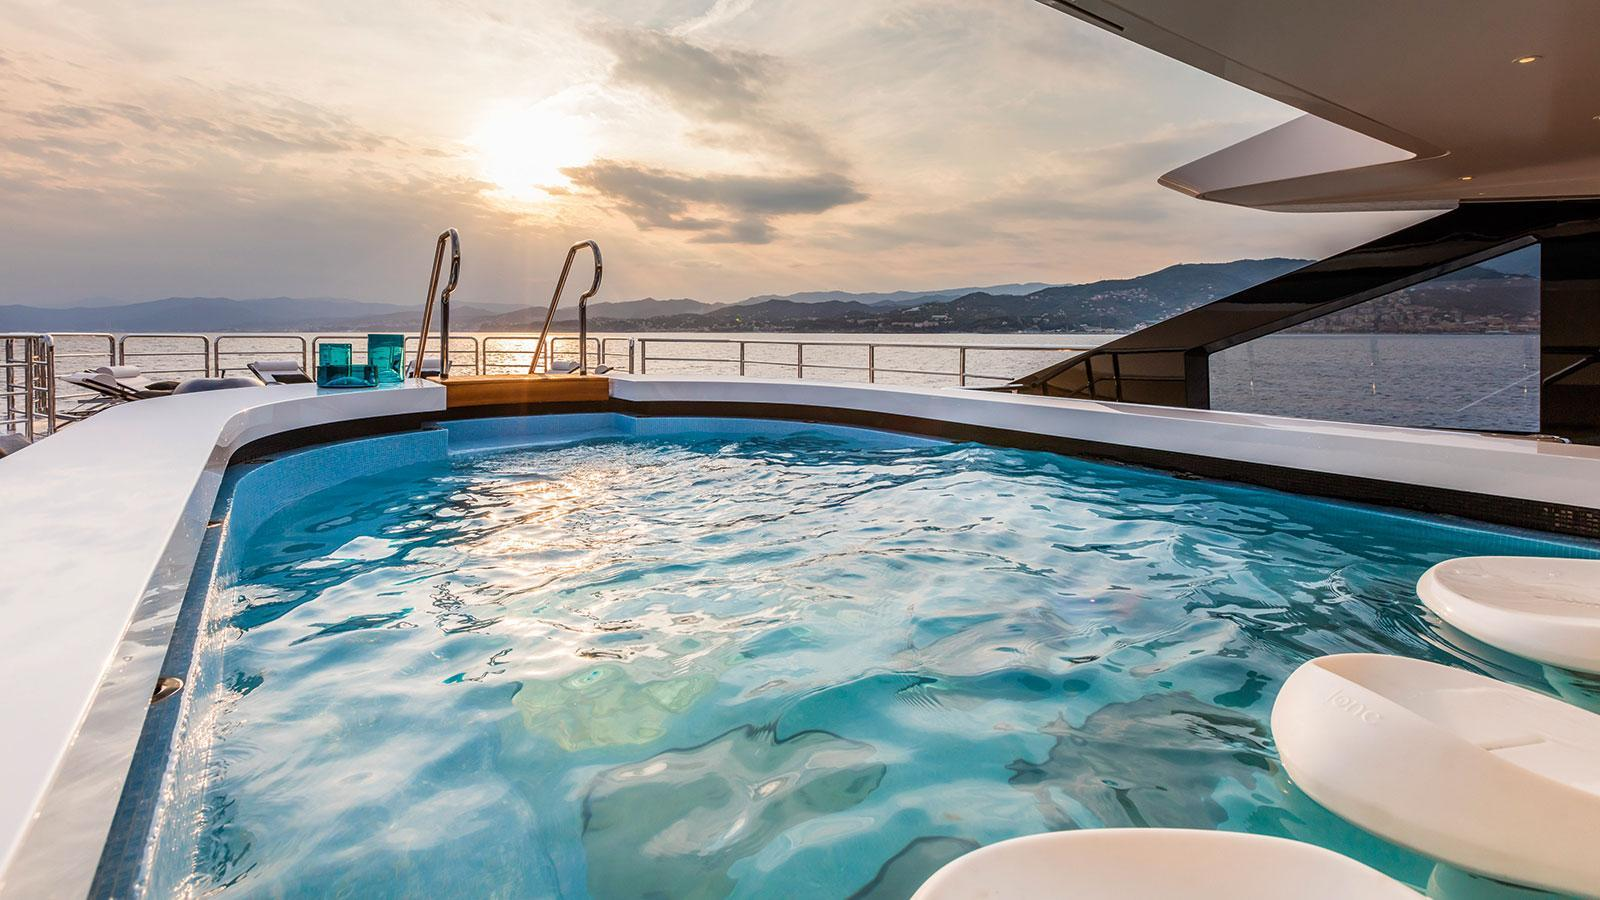 suerte-motor-yacht-tankoa-2015-69m-pool